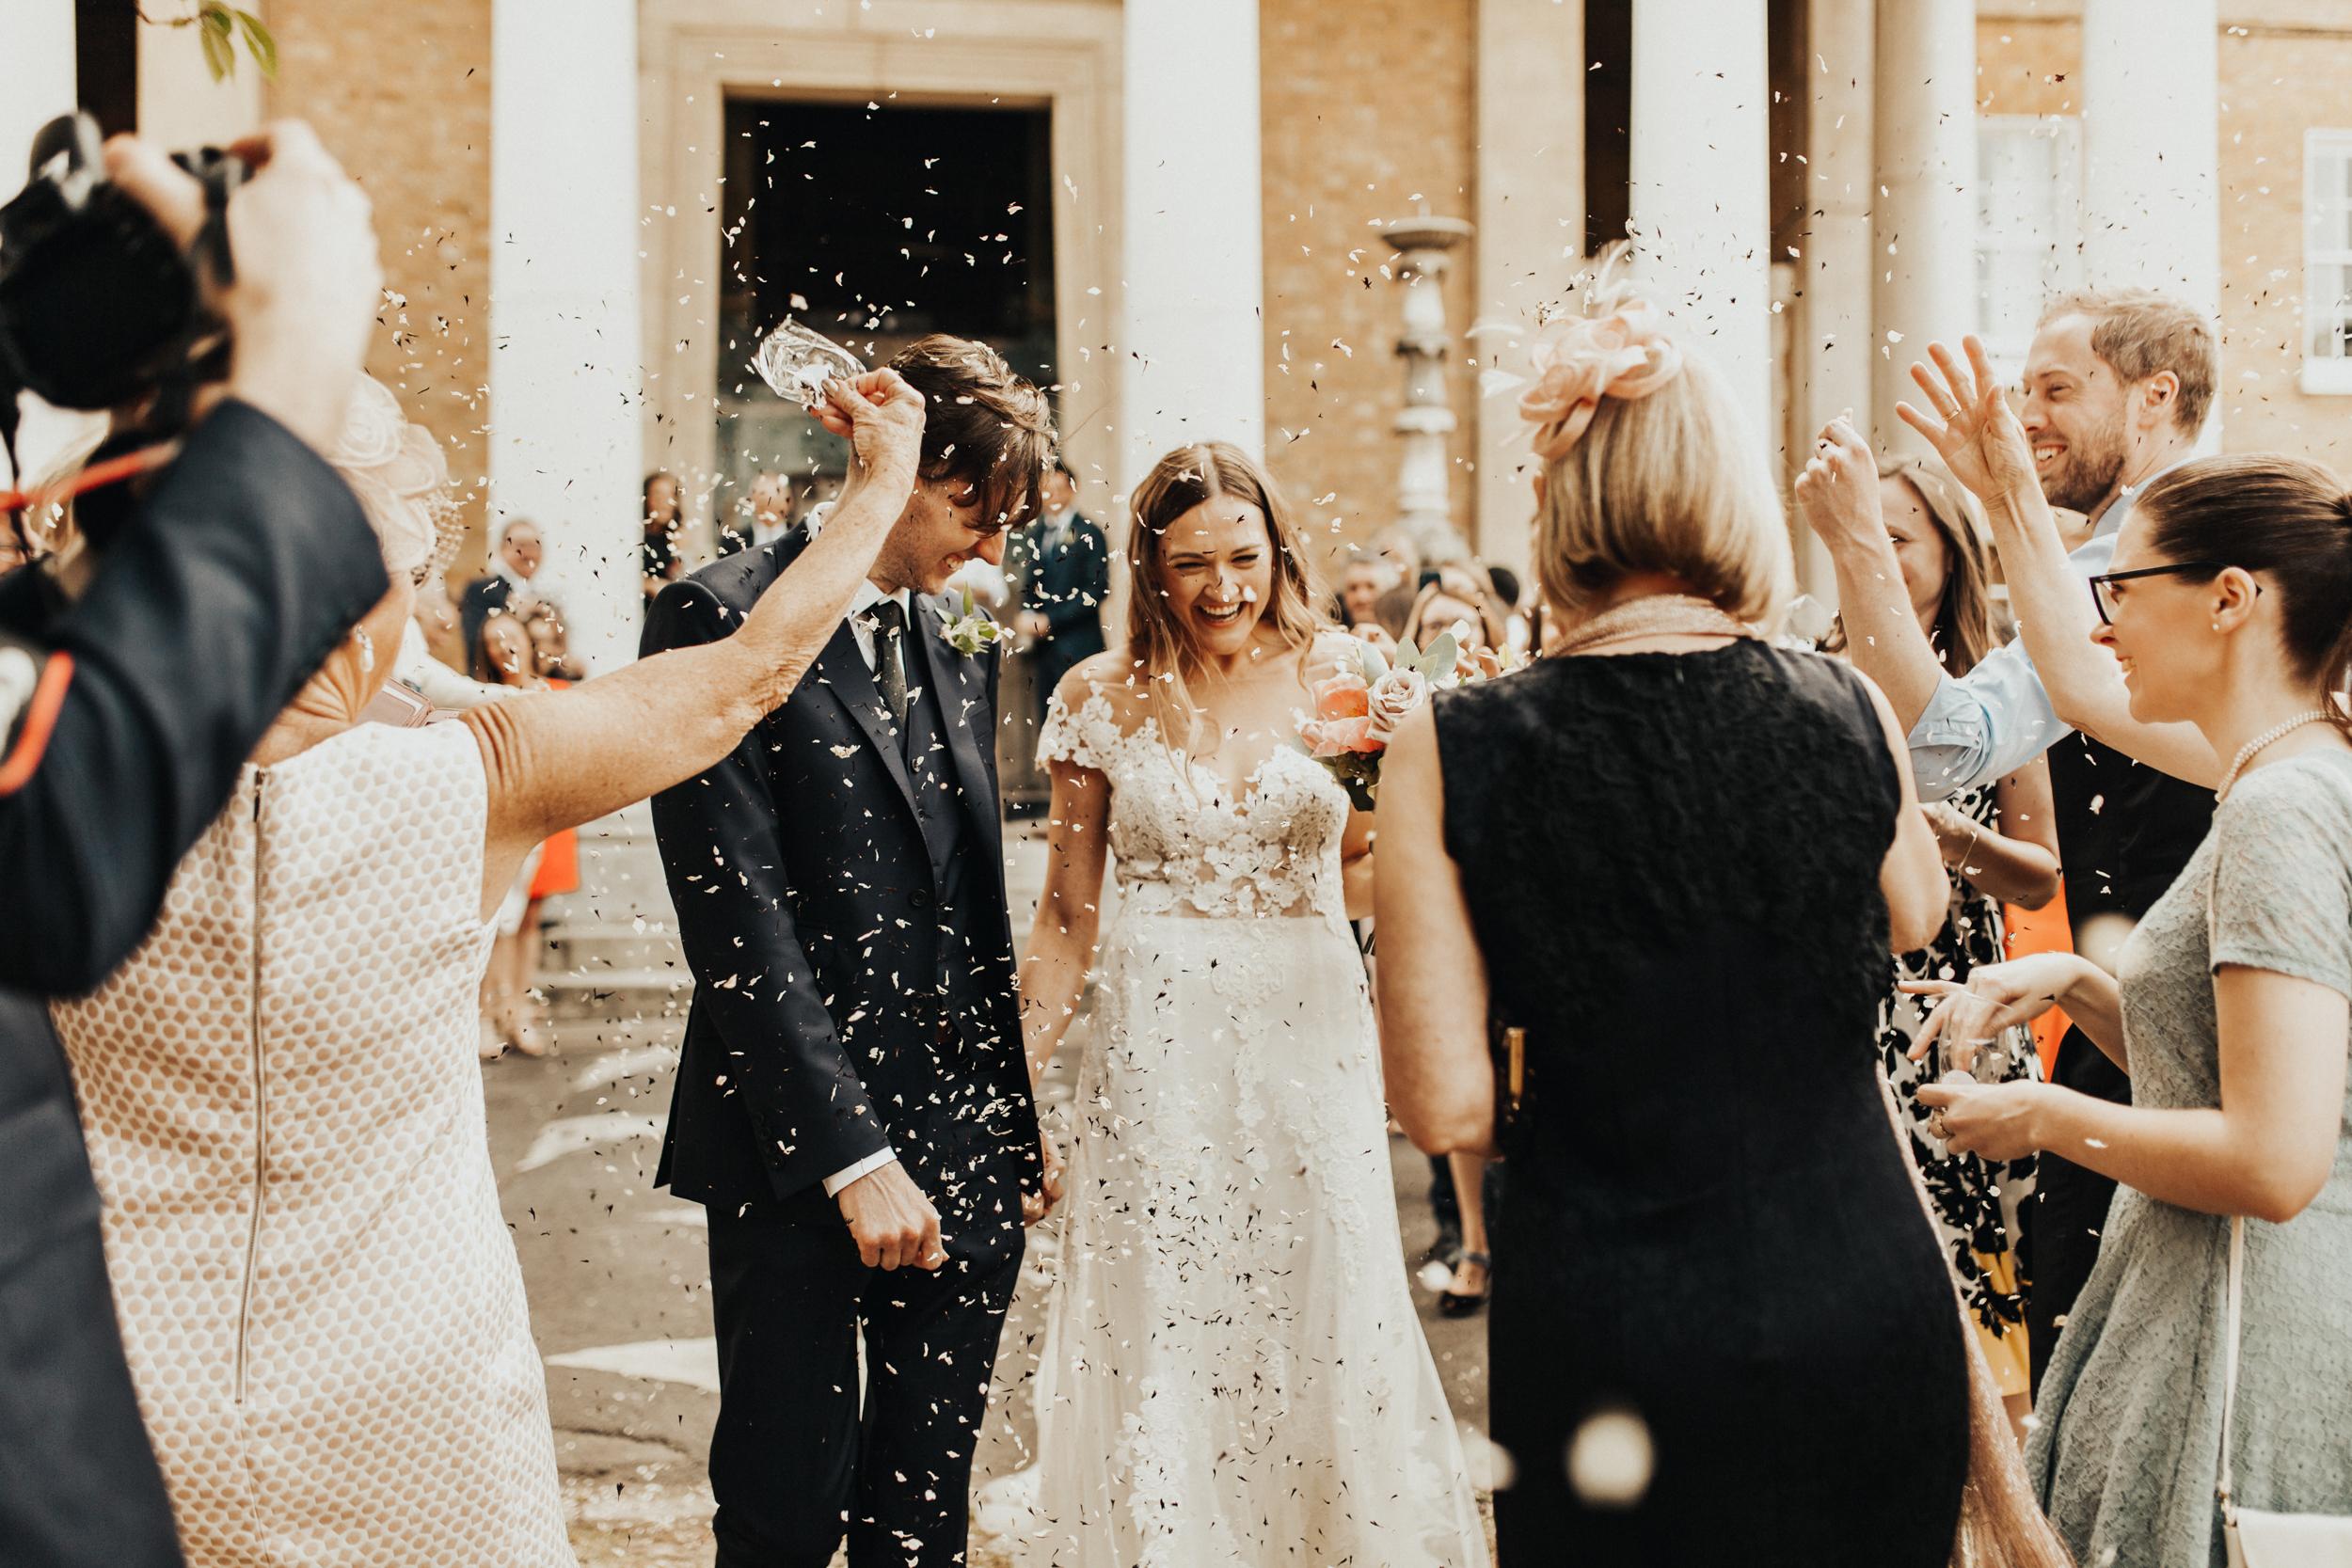 Laura-Benn-The-Asylum-London-The-Ace-Hotel-Wedding-Alternative-Darina-Stoda-Photography-247.jpg